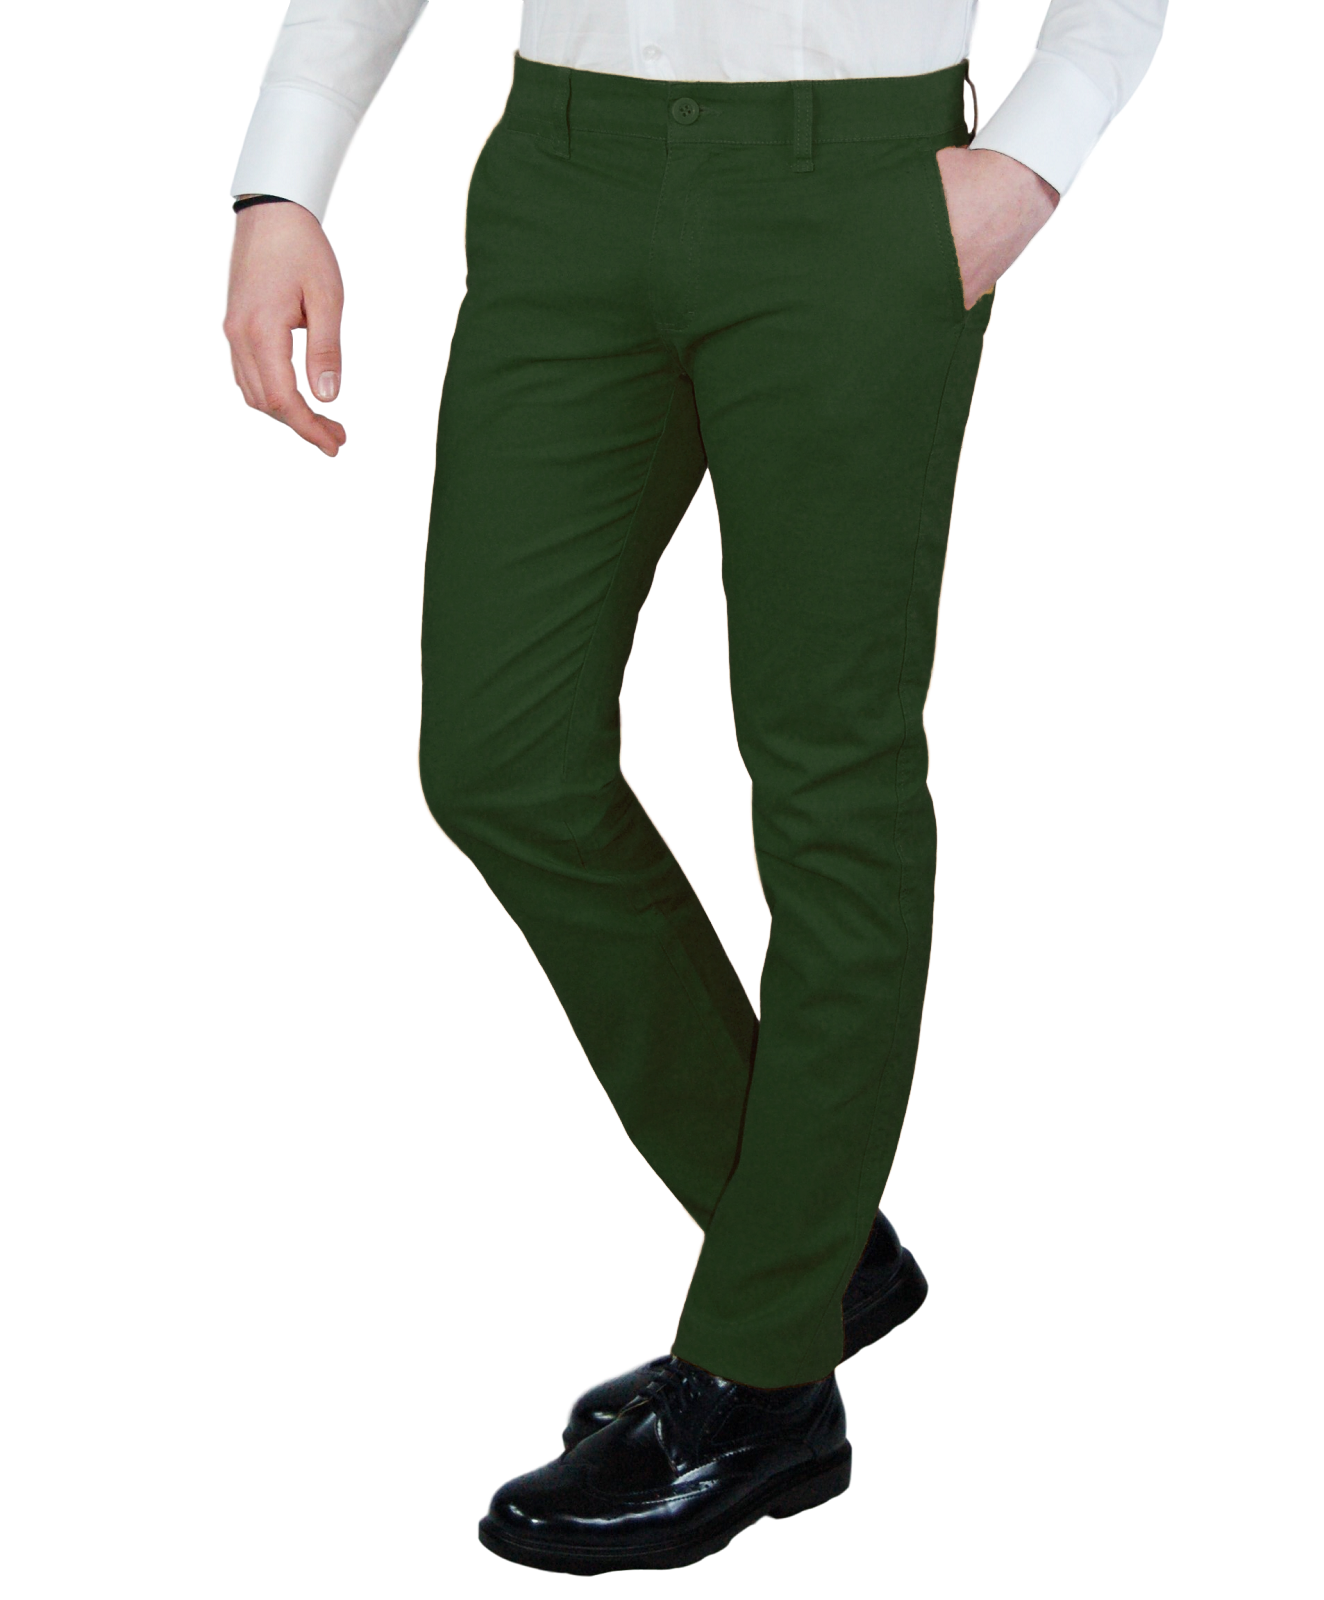 Pantalone-Uomo-Chino-Primaverile-slim-fit-Pantaloni-Eleganti-Blu-Verde-Nero miniatura 20